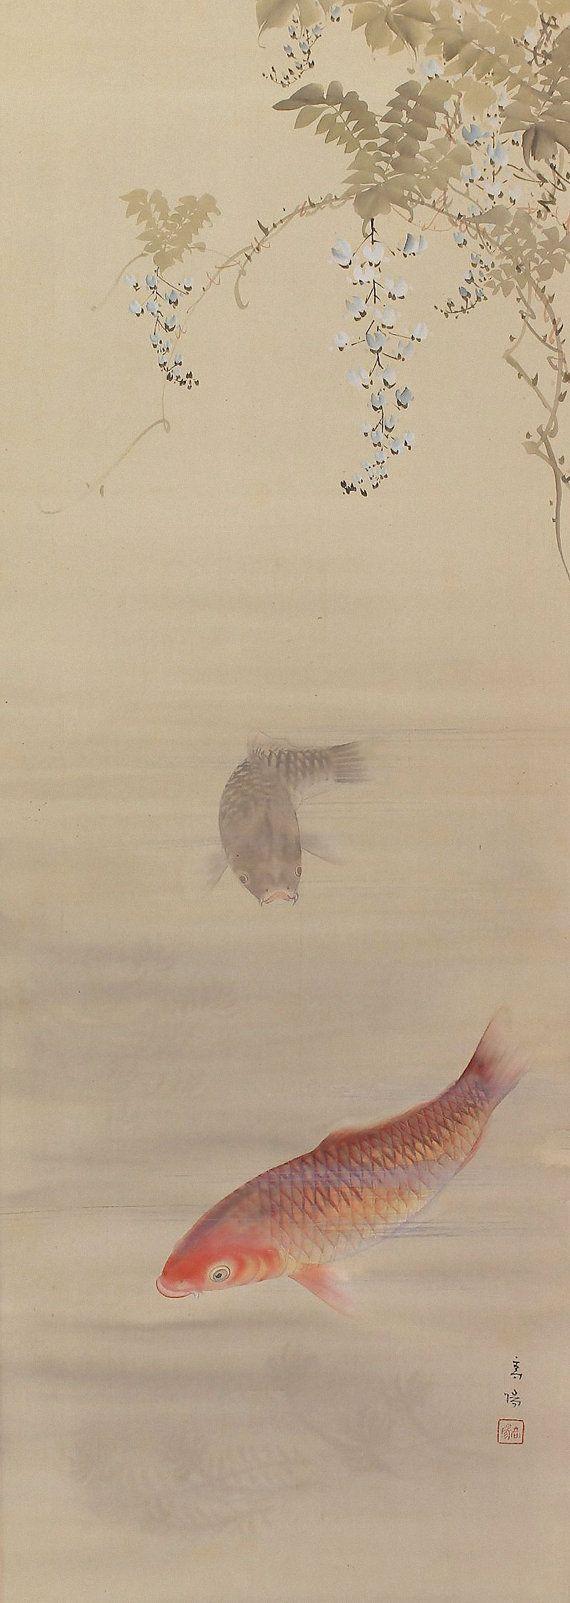 A Pair of Carp Koi Fish. Nakayama Koyo (1717−1780). Japanese hanging scroll kakejiku.